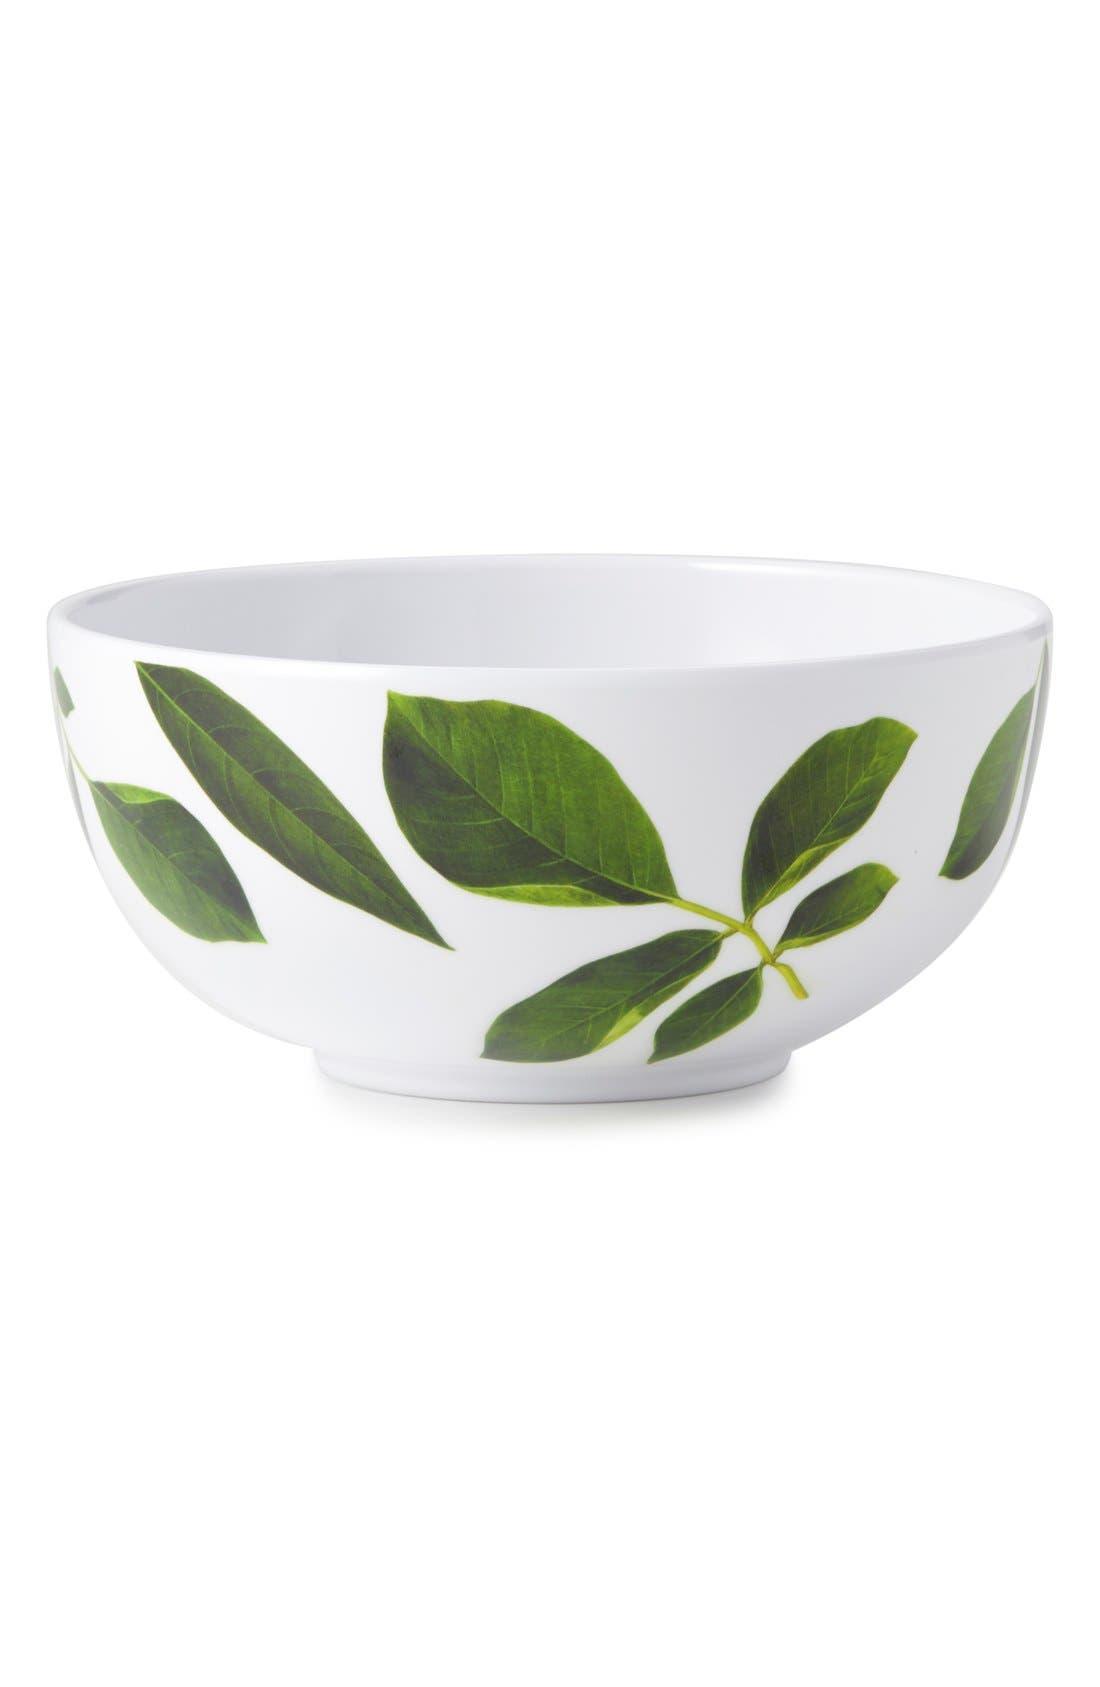 Main Image - kate spade new york 'patio floral' melamine bowl